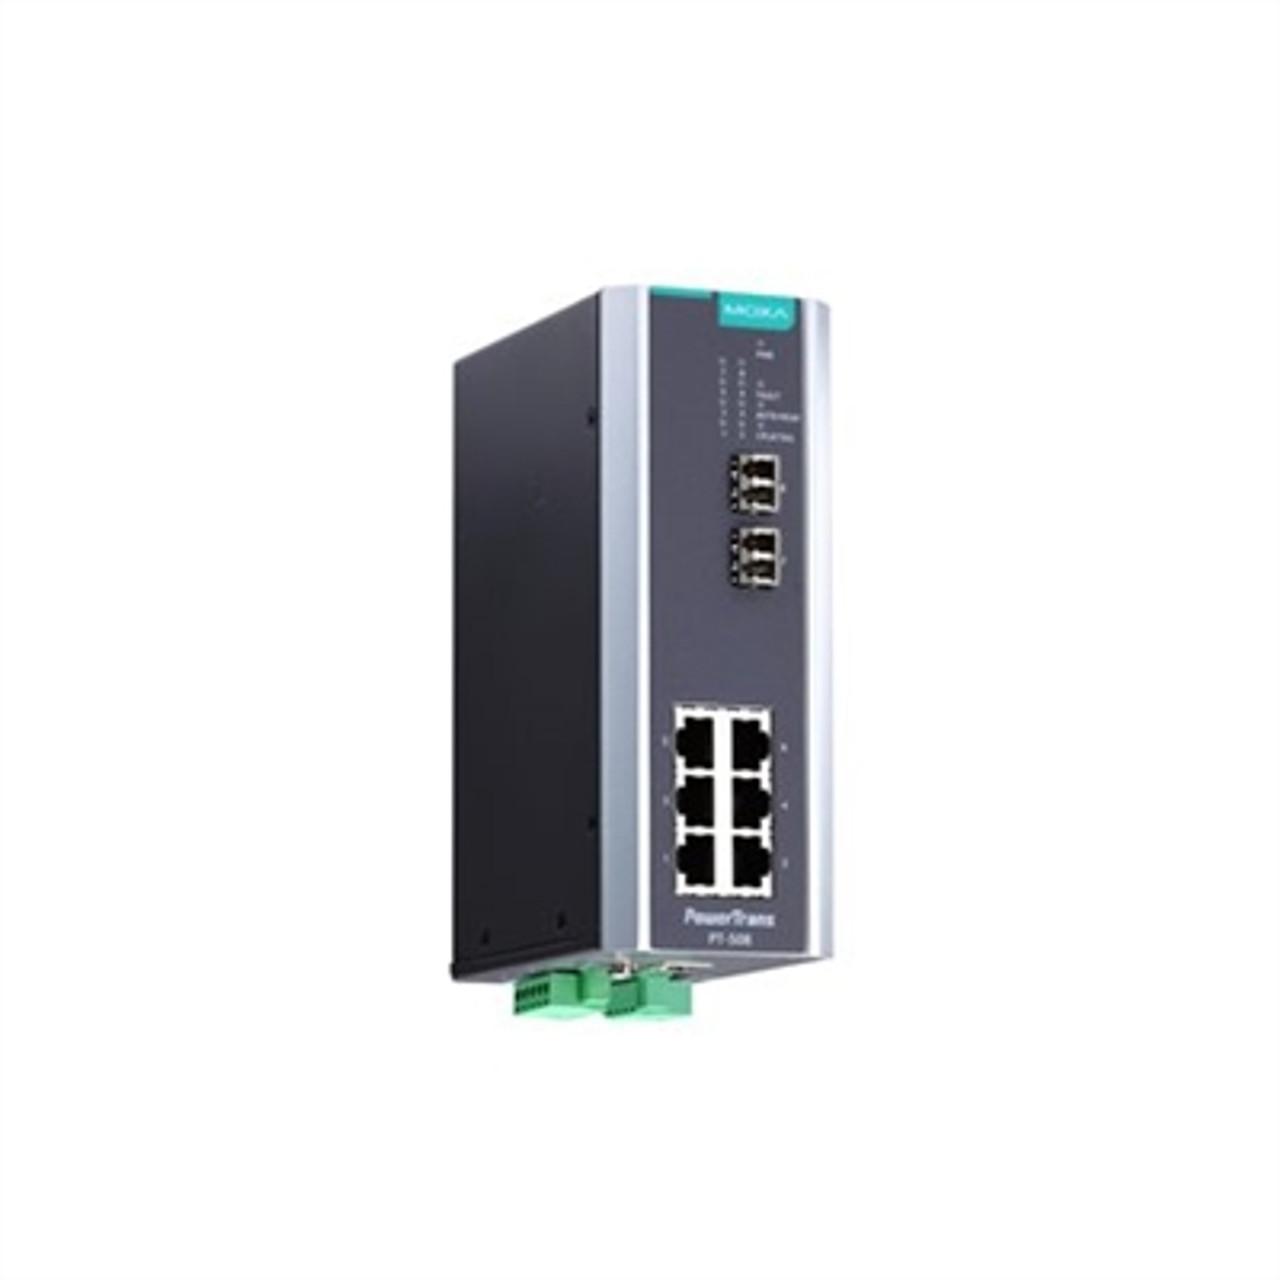 Moxa PT-508-SS-SC-HV managed DIN-rail Ethernet switch